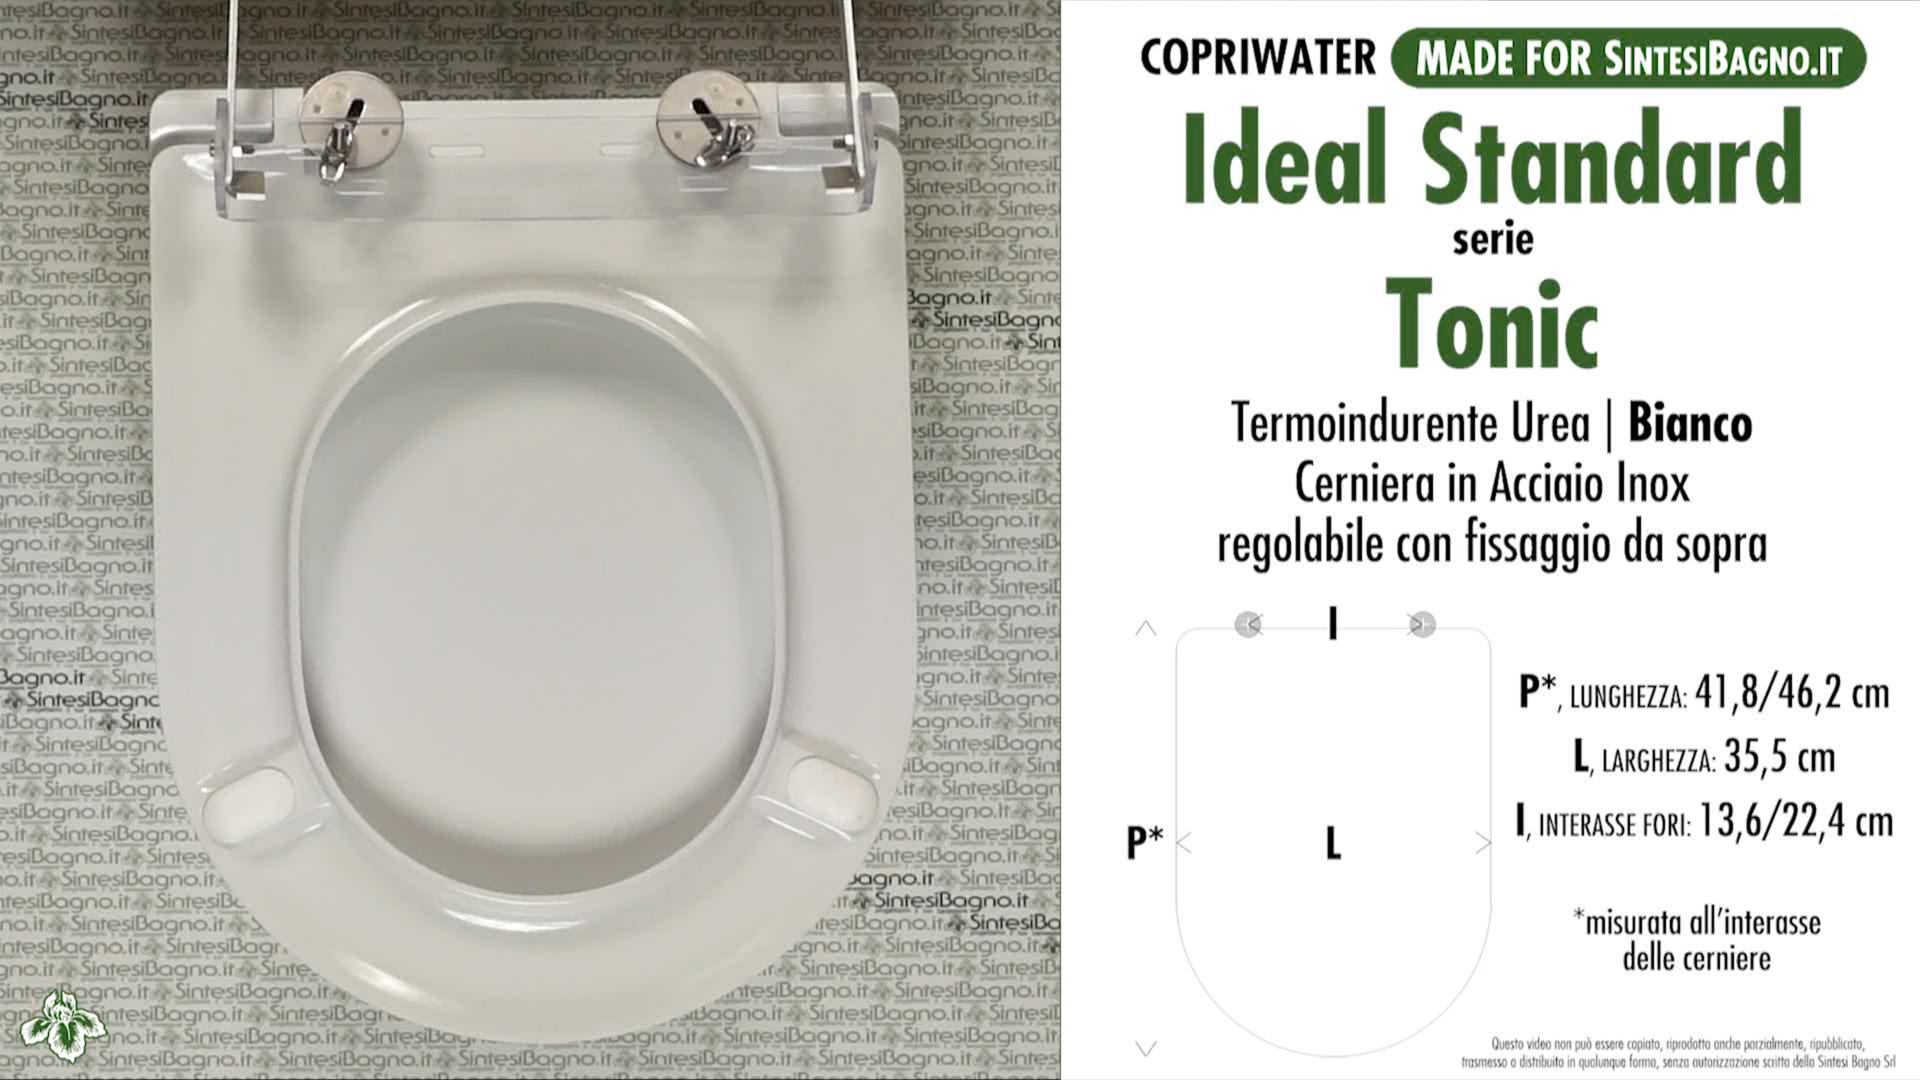 copriwater per vaso tonic ideal standard soft close. Black Bedroom Furniture Sets. Home Design Ideas